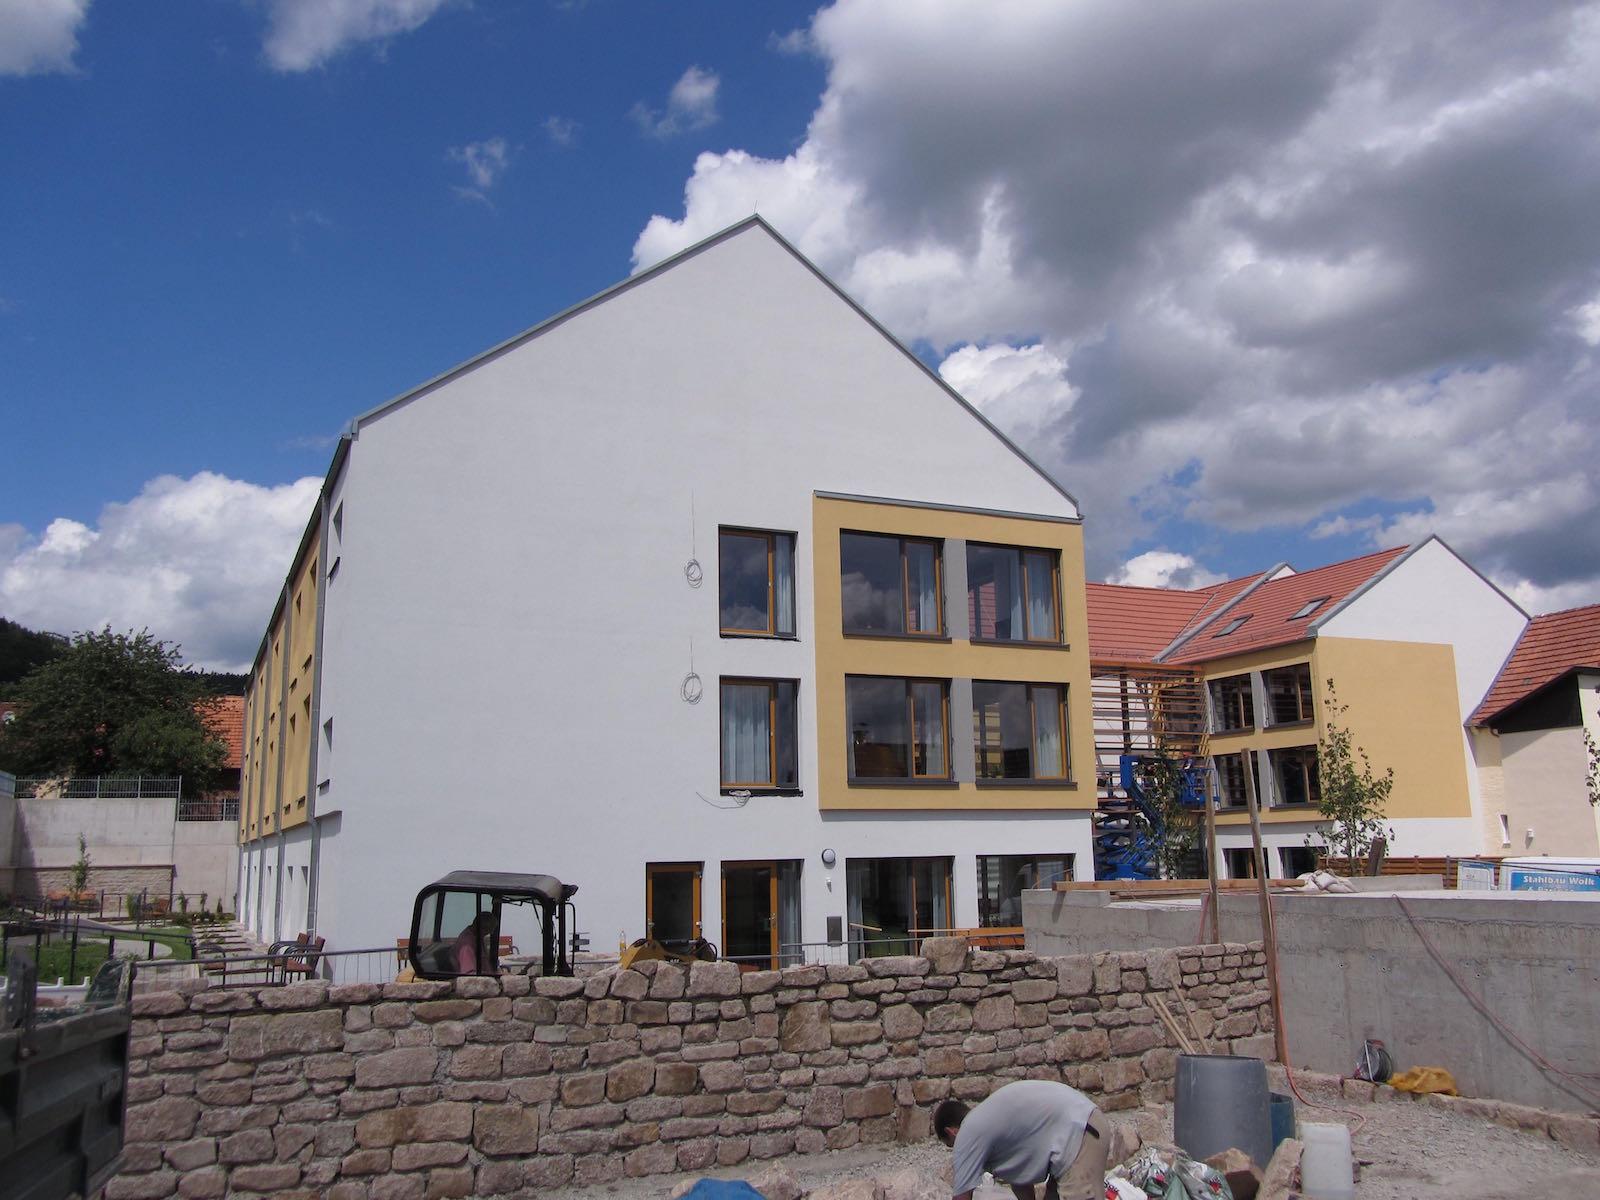 altenpflegeheim-creuzburg-4